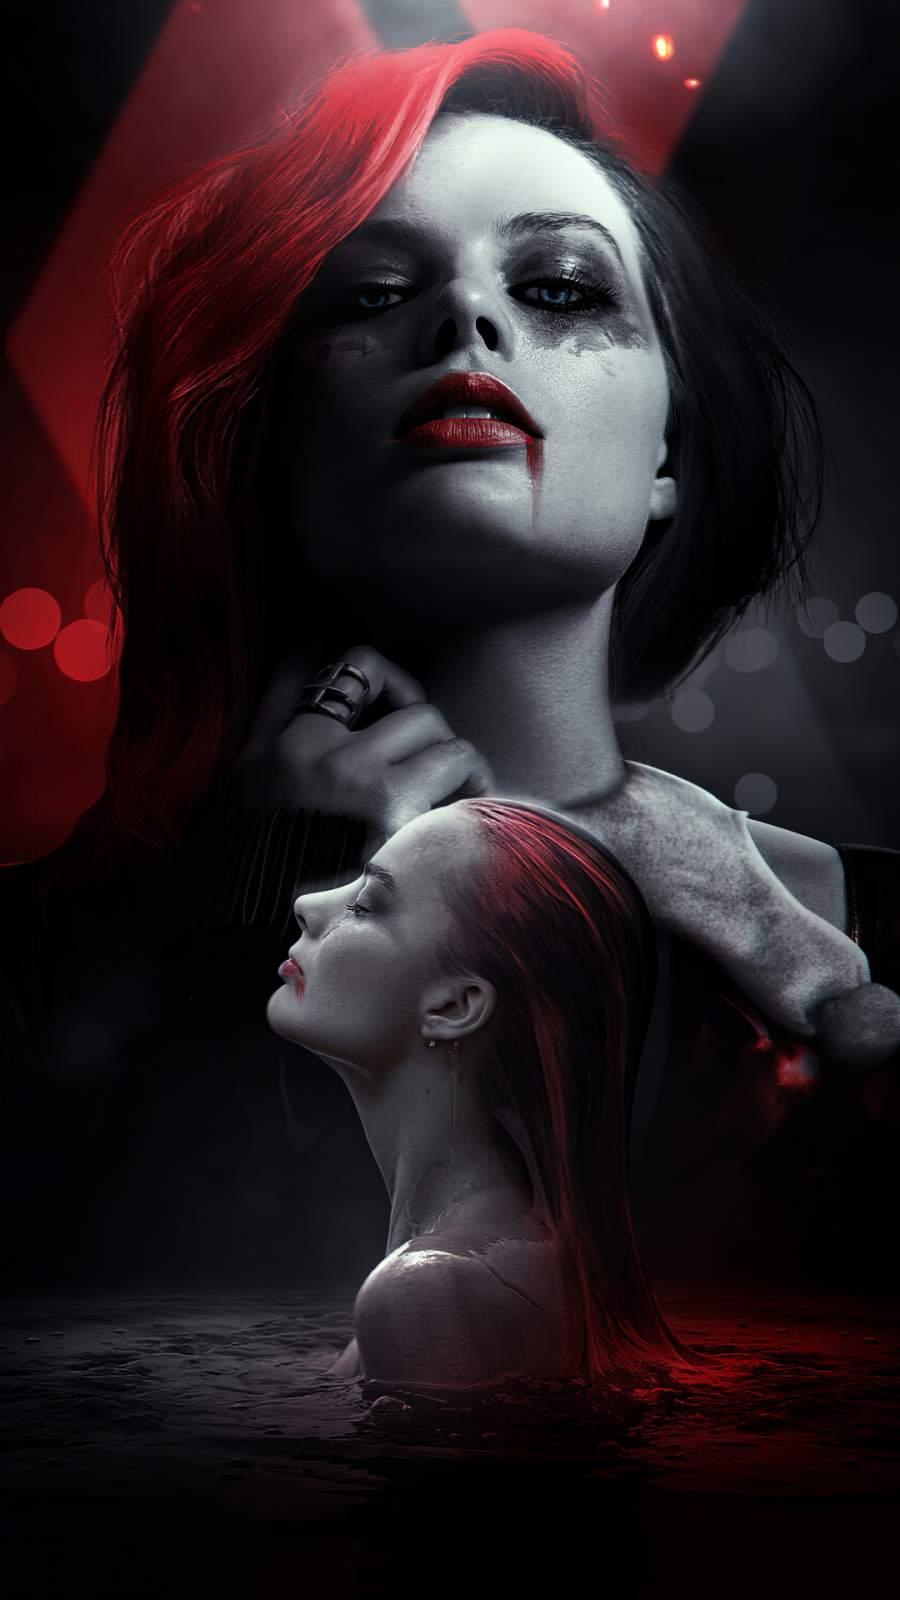 Harley Quinn 4K iPhone Wallpaper